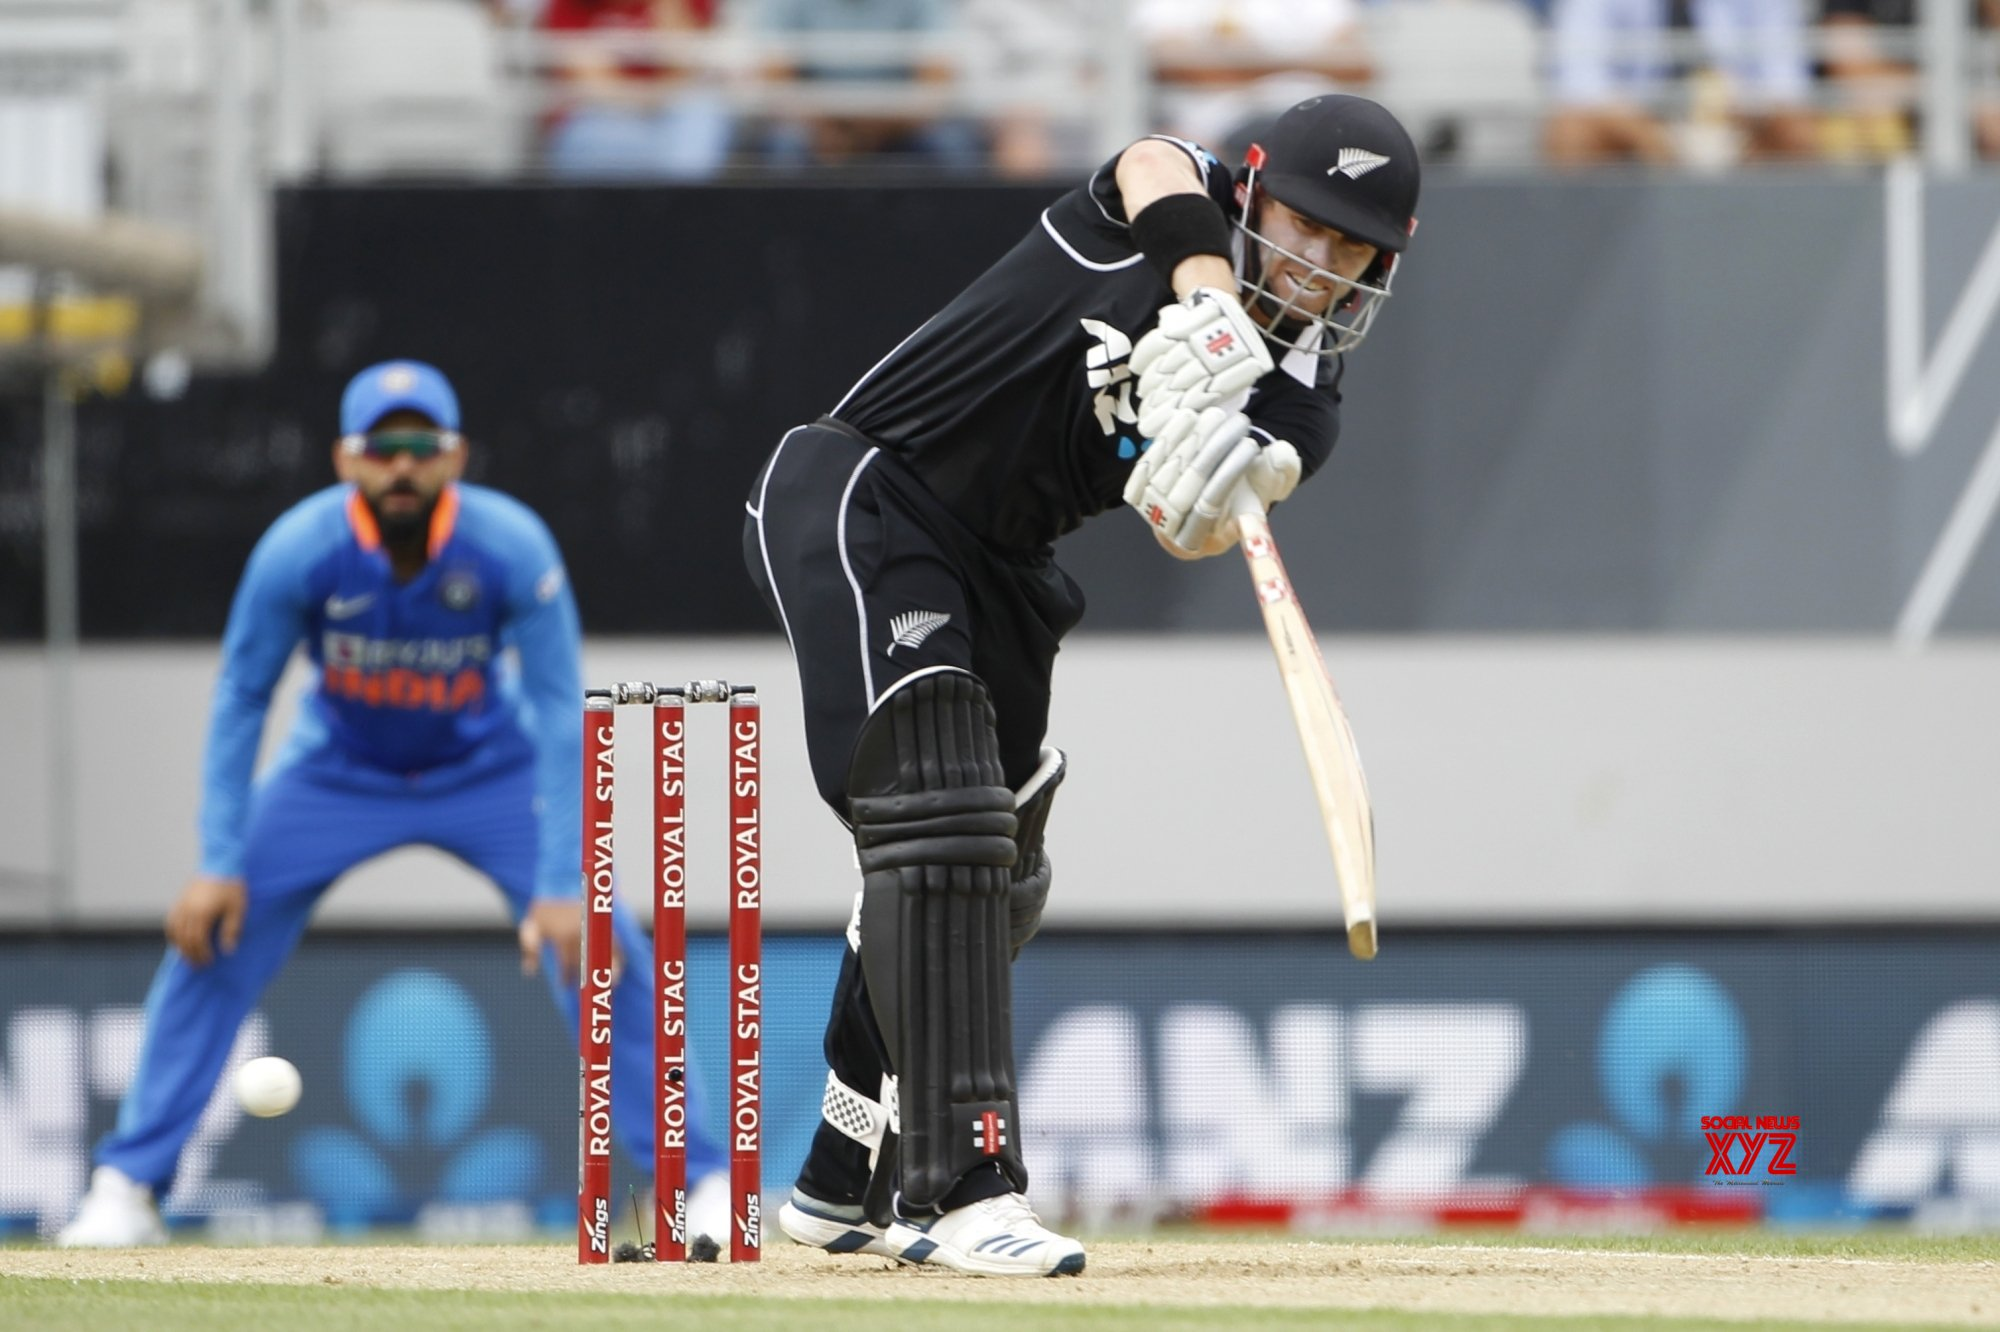 Auckland: 2nd ODI - India Vs New Zealand (Batch - 1) #Gallery